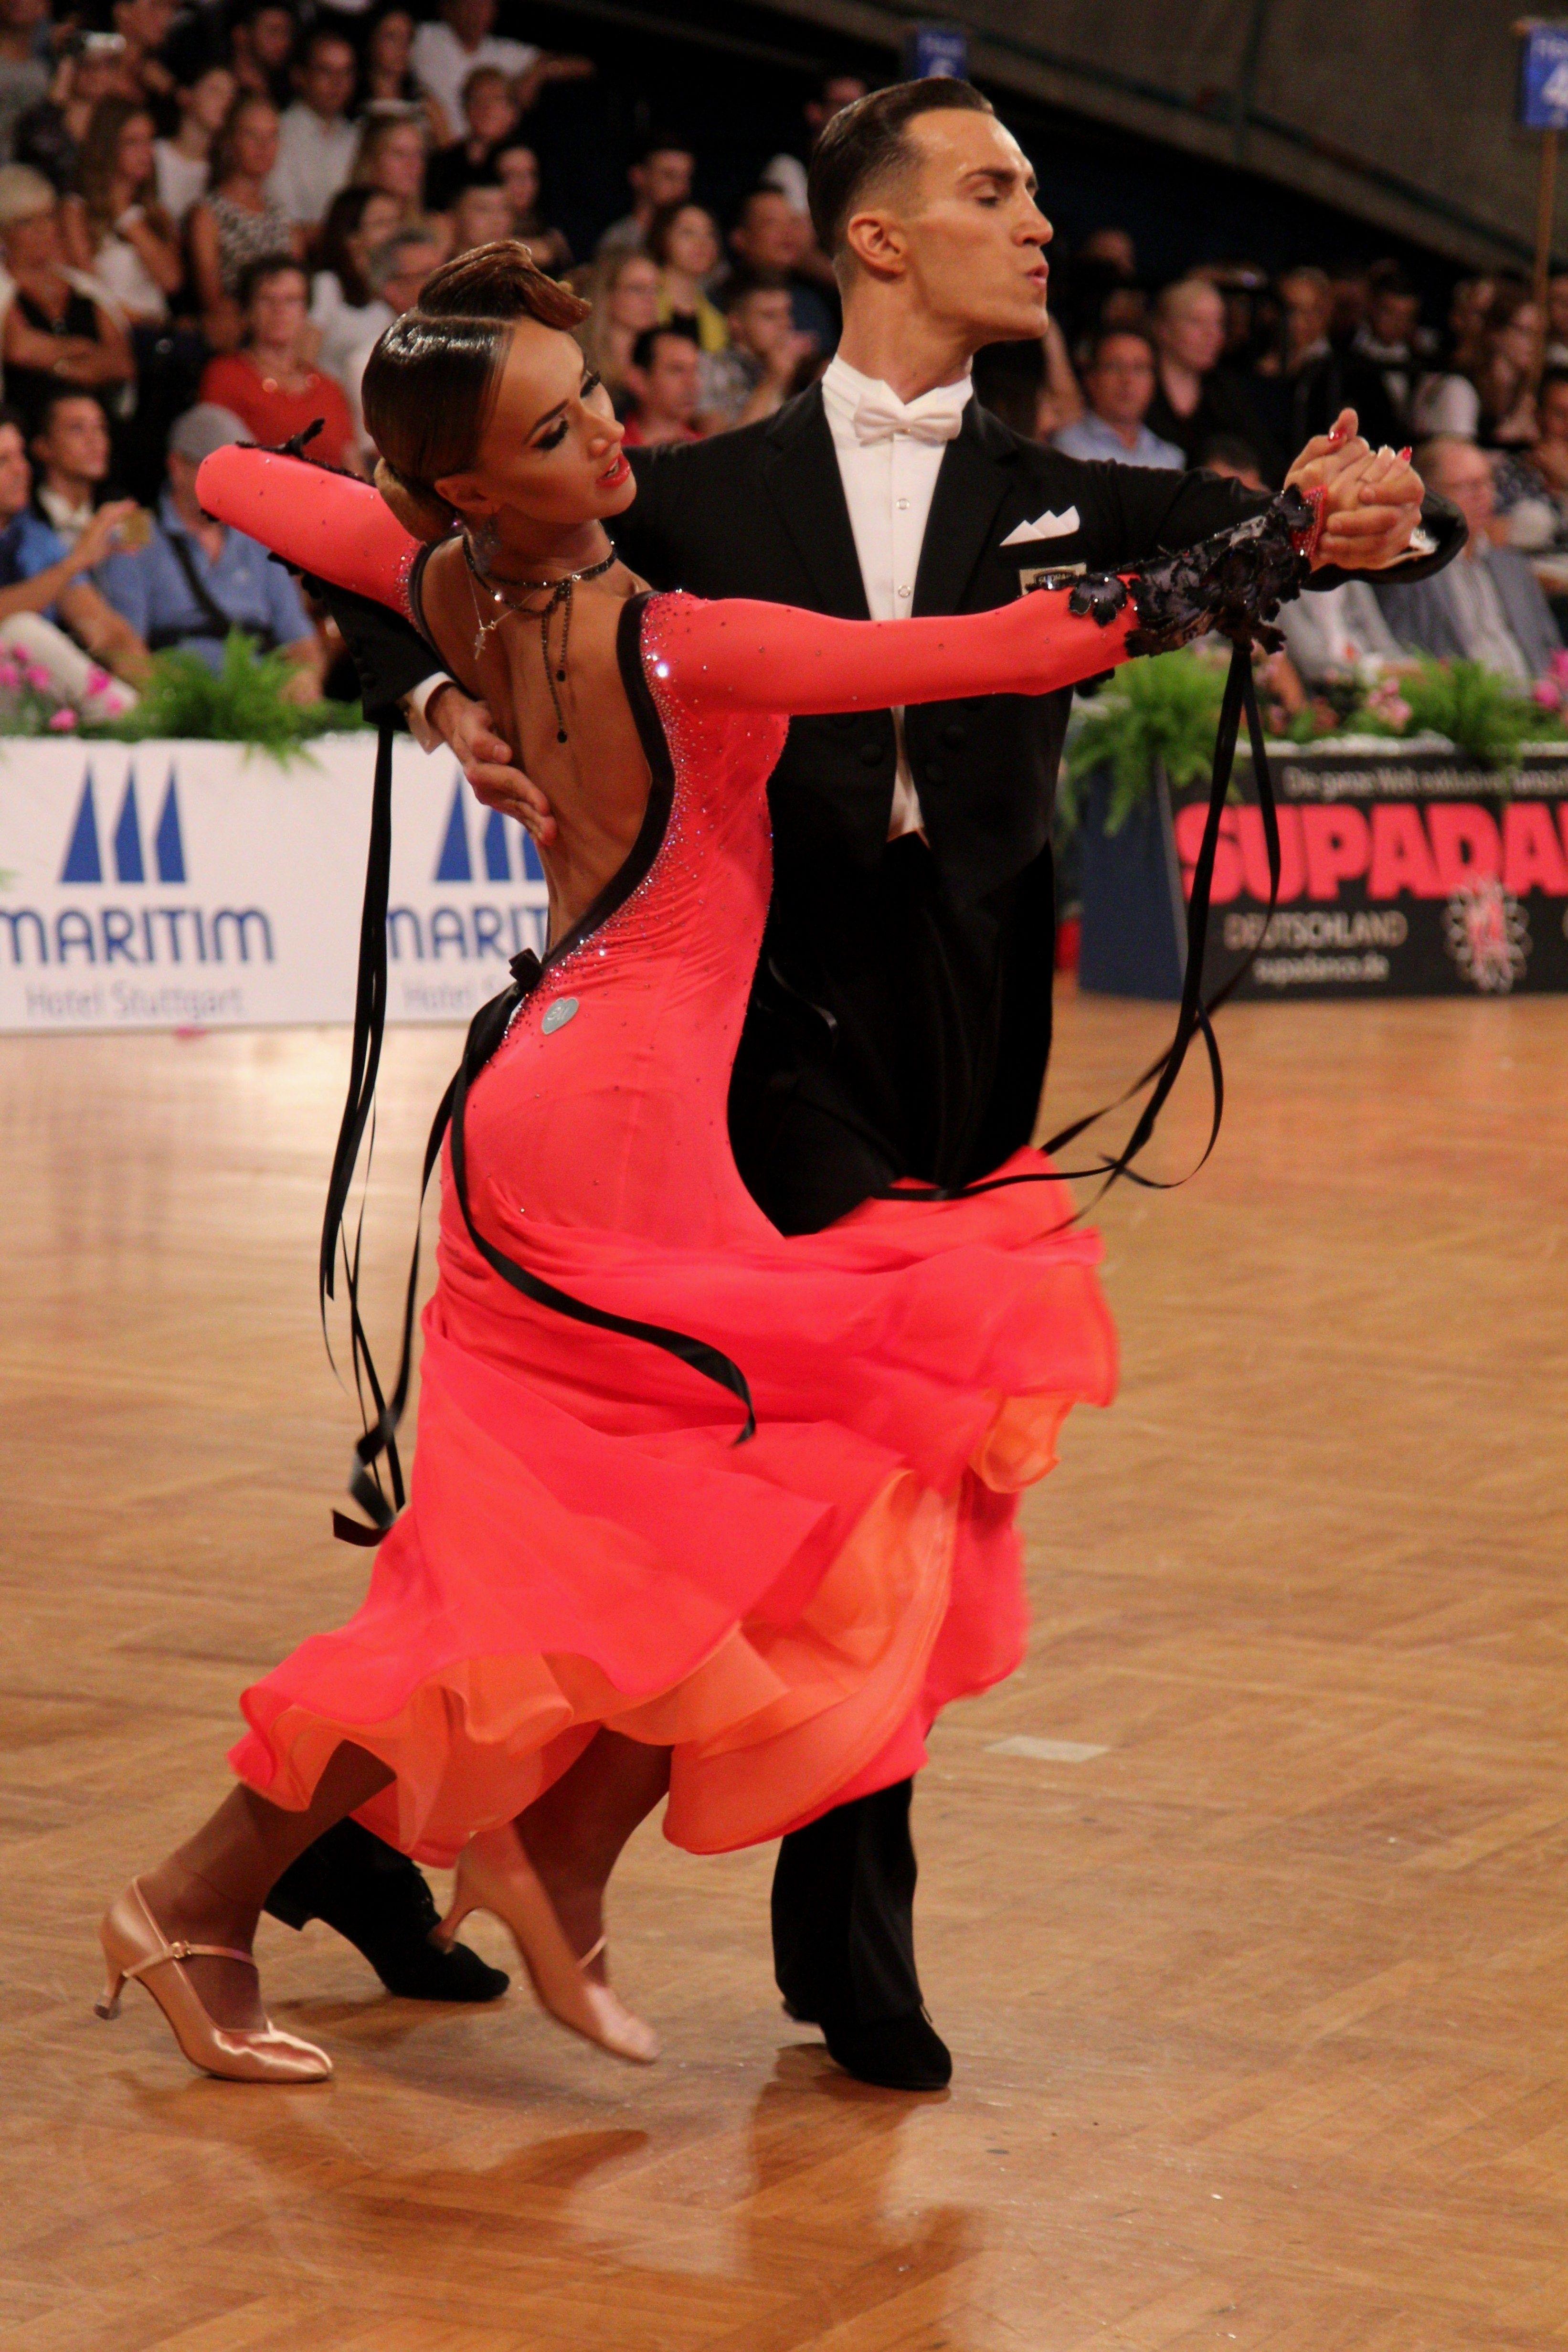 Salsa Dancing For Fitness Ballroom Dancing Hull Ballroom Dancing Is As Popular As At Any Time O Dancesport Dresses Ballroom Dress Inspiration Dance Dresses